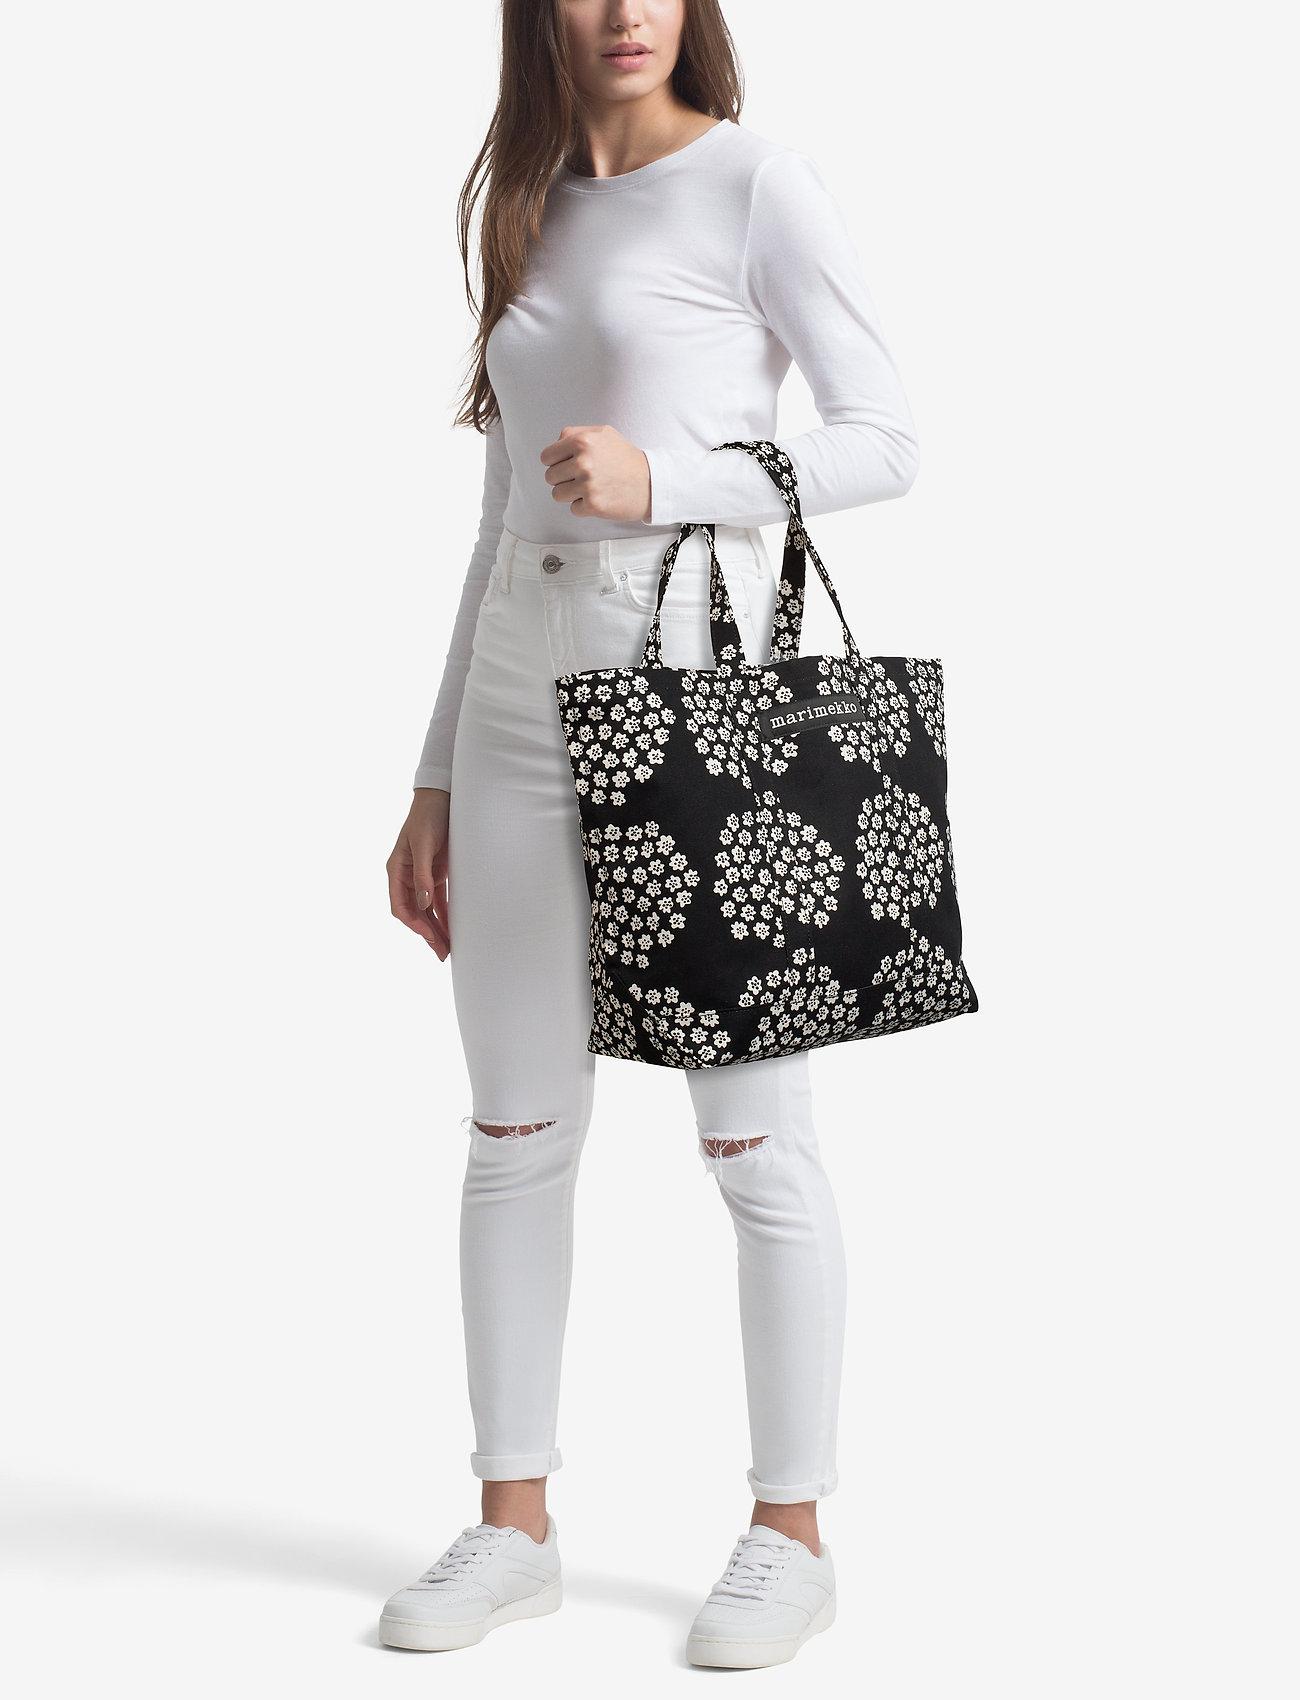 Marimekko PERUSKASSI PUKETTI Bag - BLACK,WHITE,BLACK